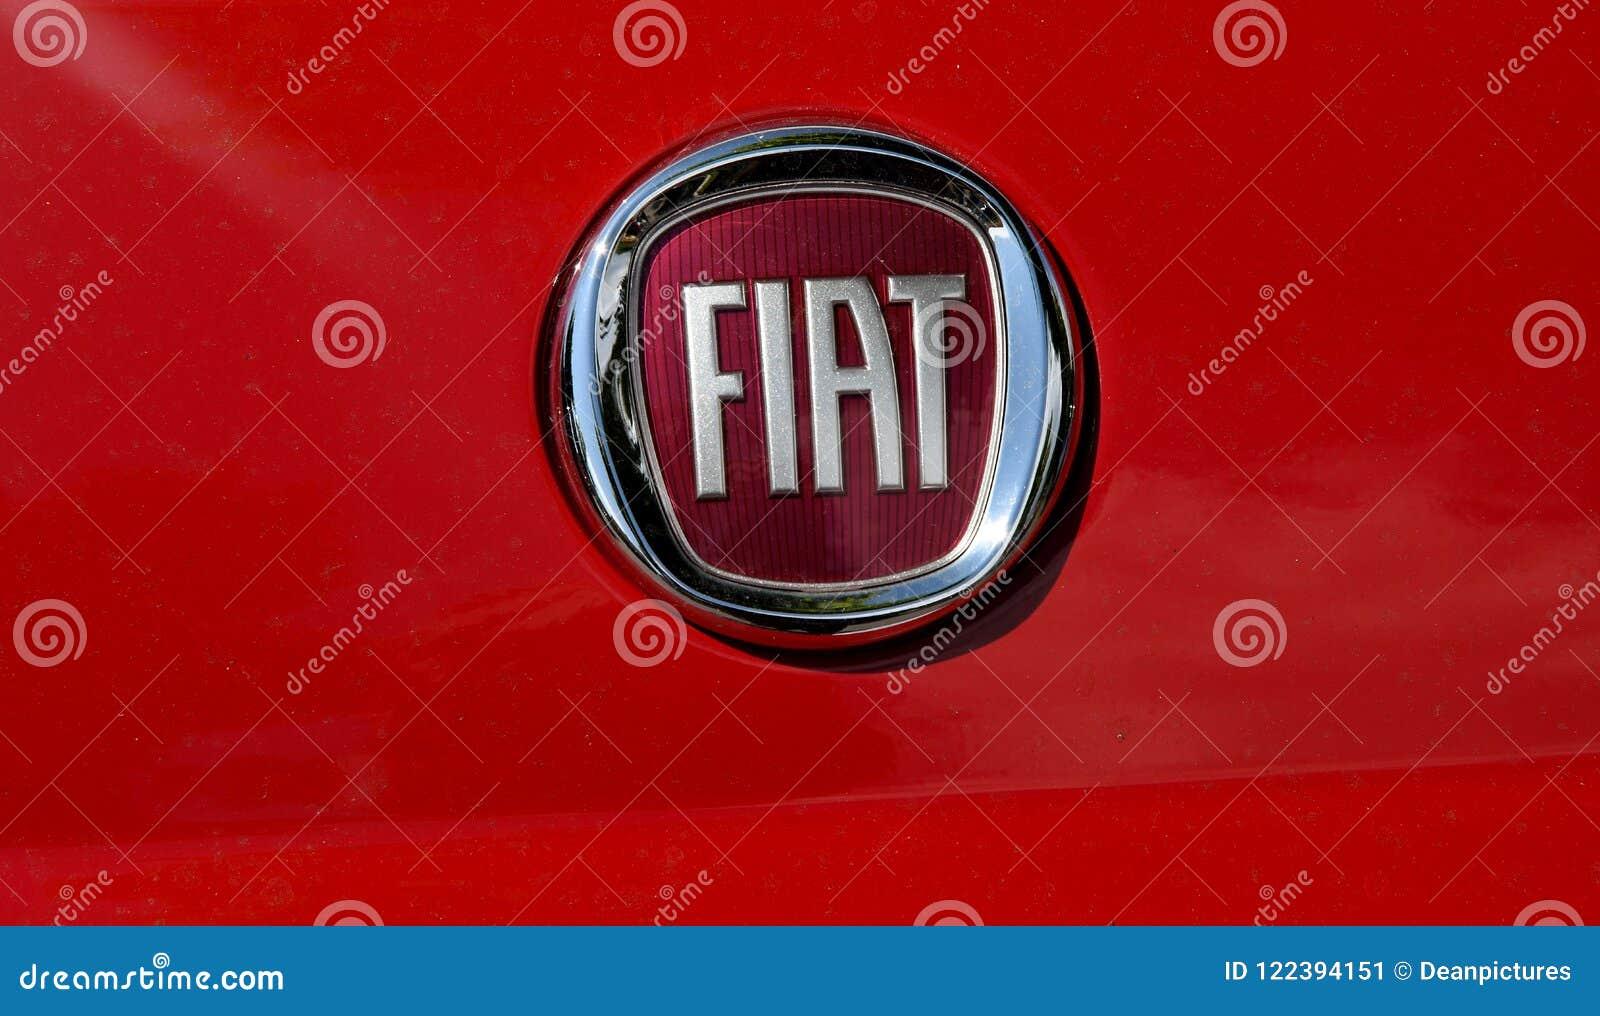 Fiat Auto Logo Editorial Photo Image Of Finances Finanse 122394151